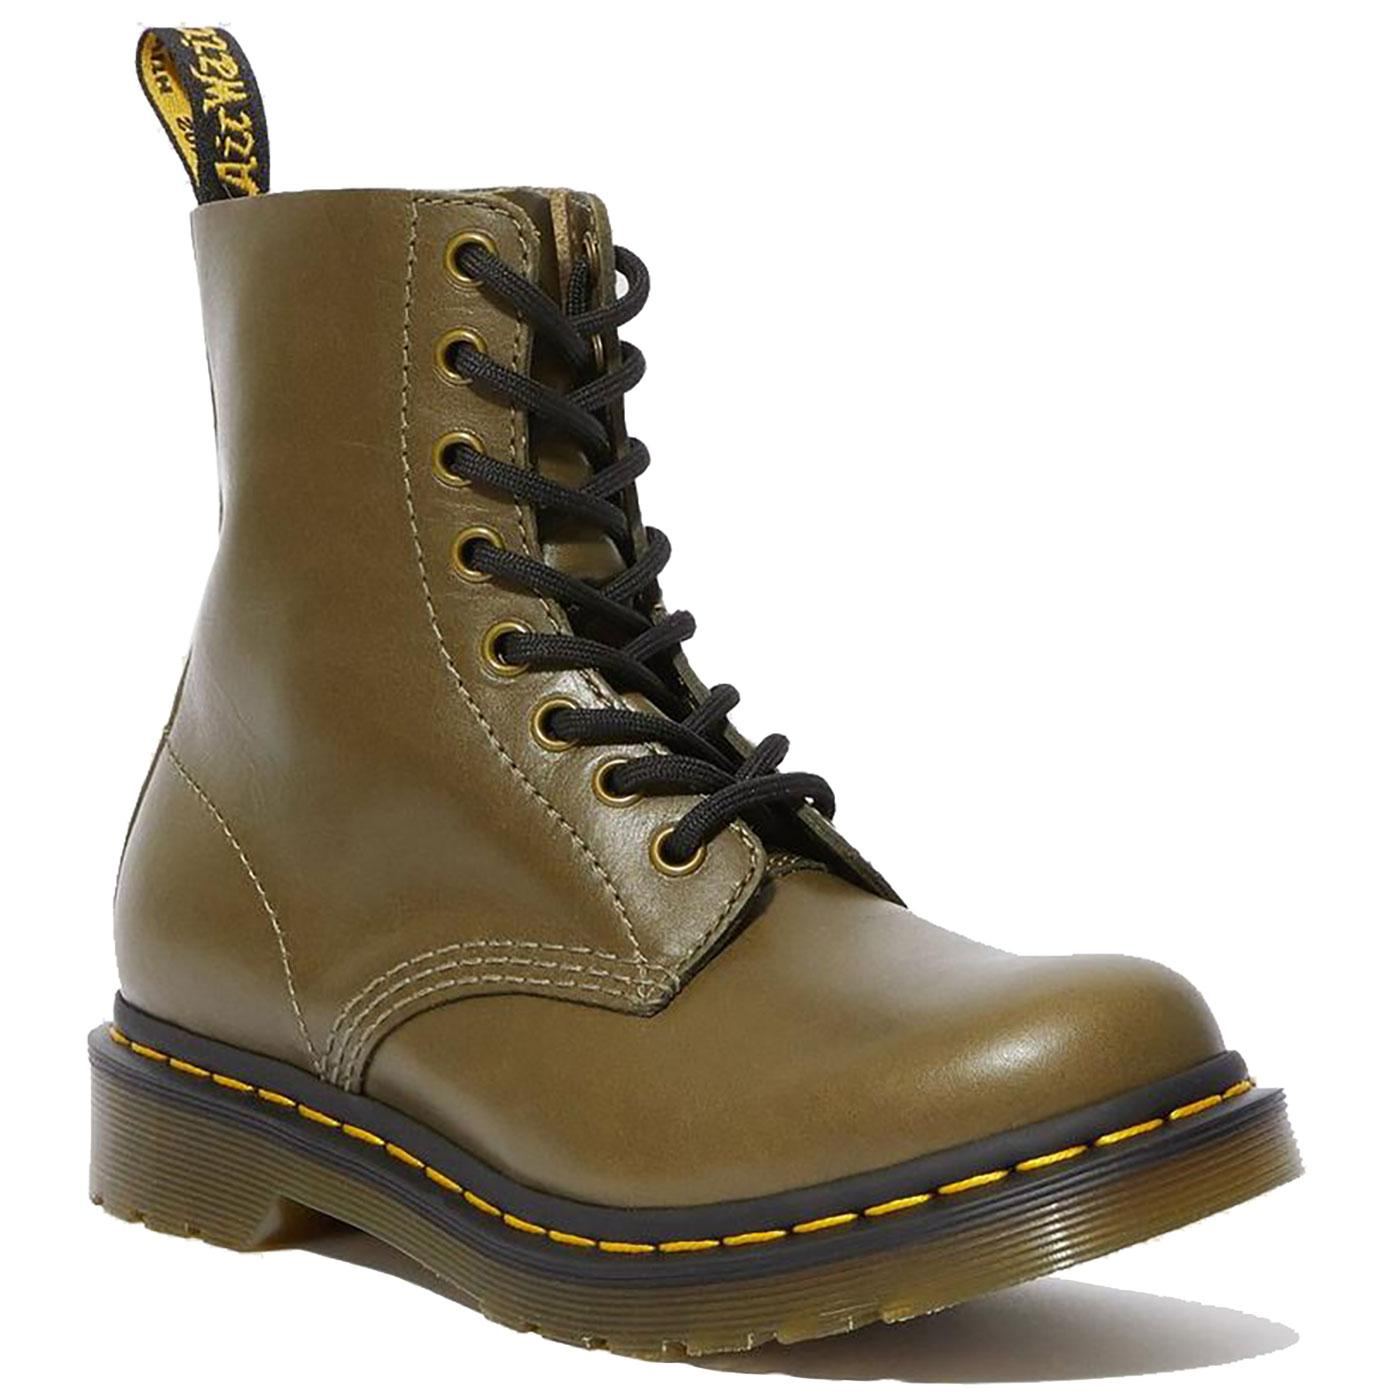 1460 Pascal Wanama DR MARTENS Womens Retro Boots O